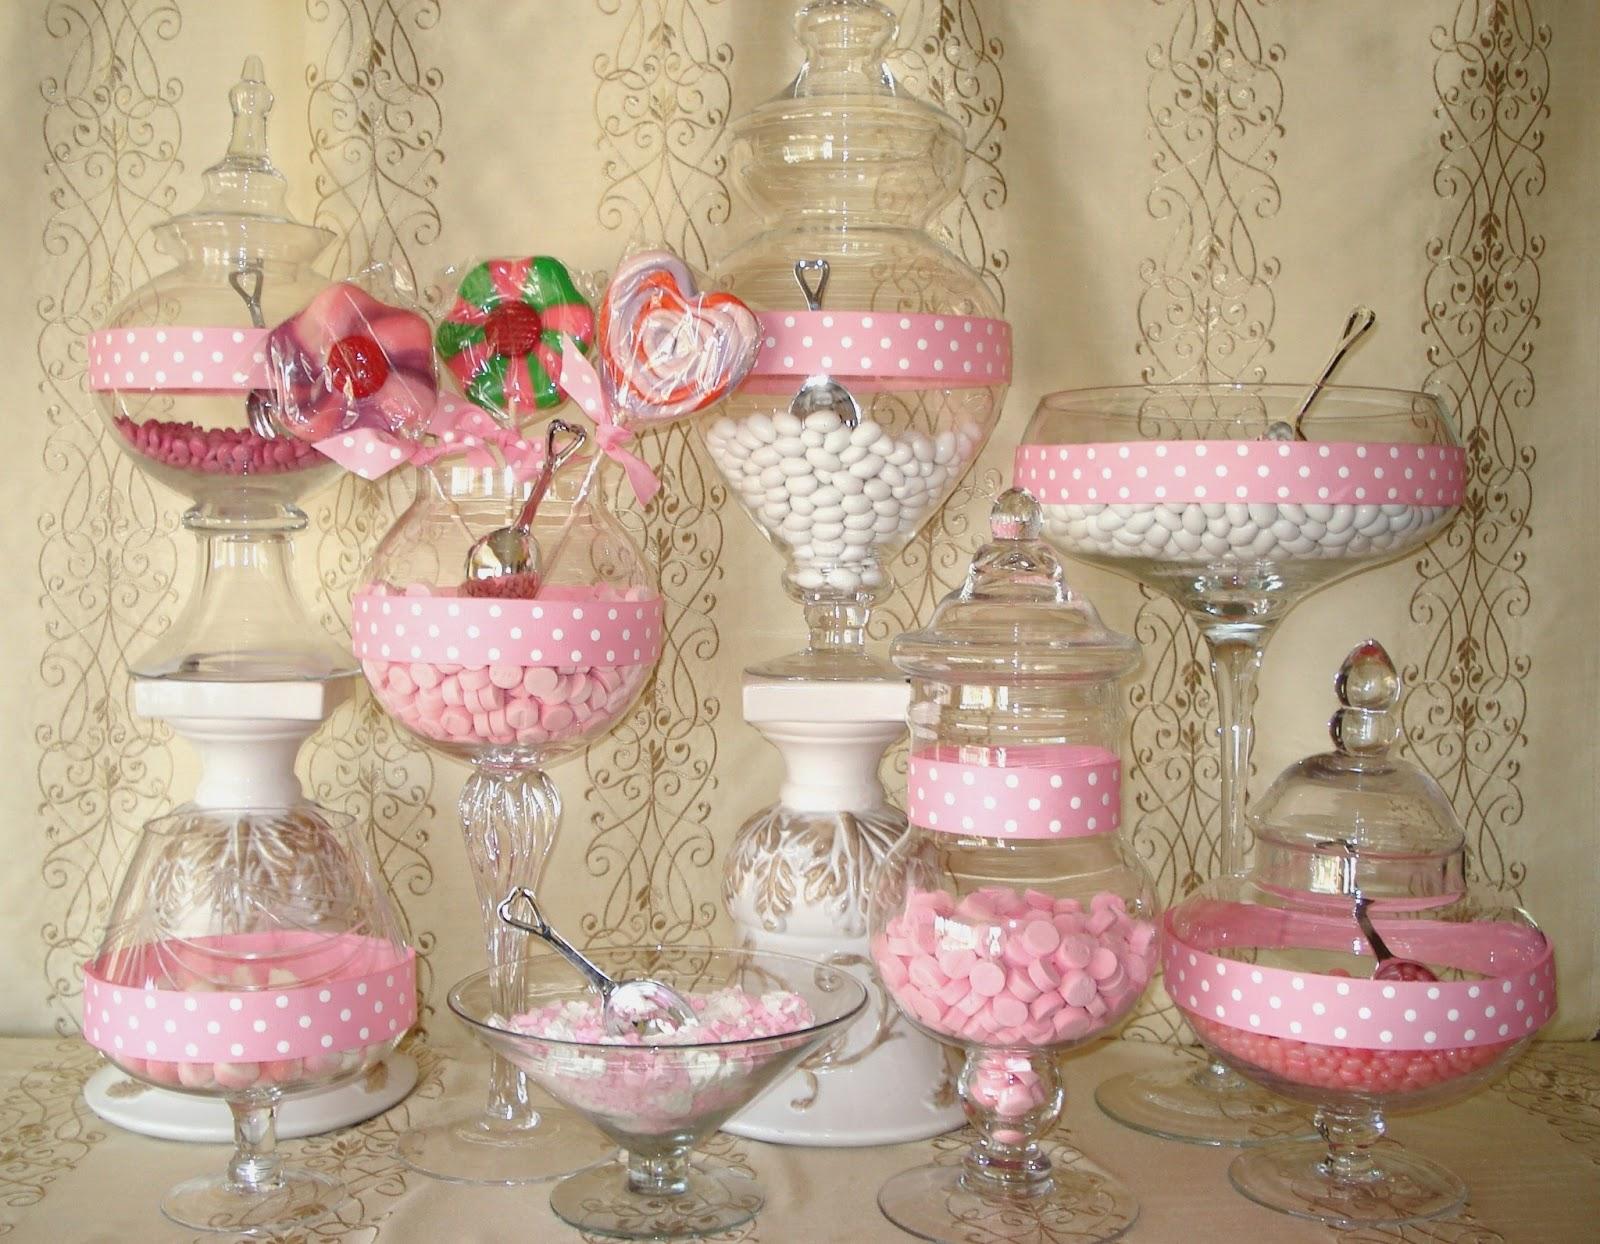 dessert bar wedding on pinterest wedding cakes wedding. Black Bedroom Furniture Sets. Home Design Ideas